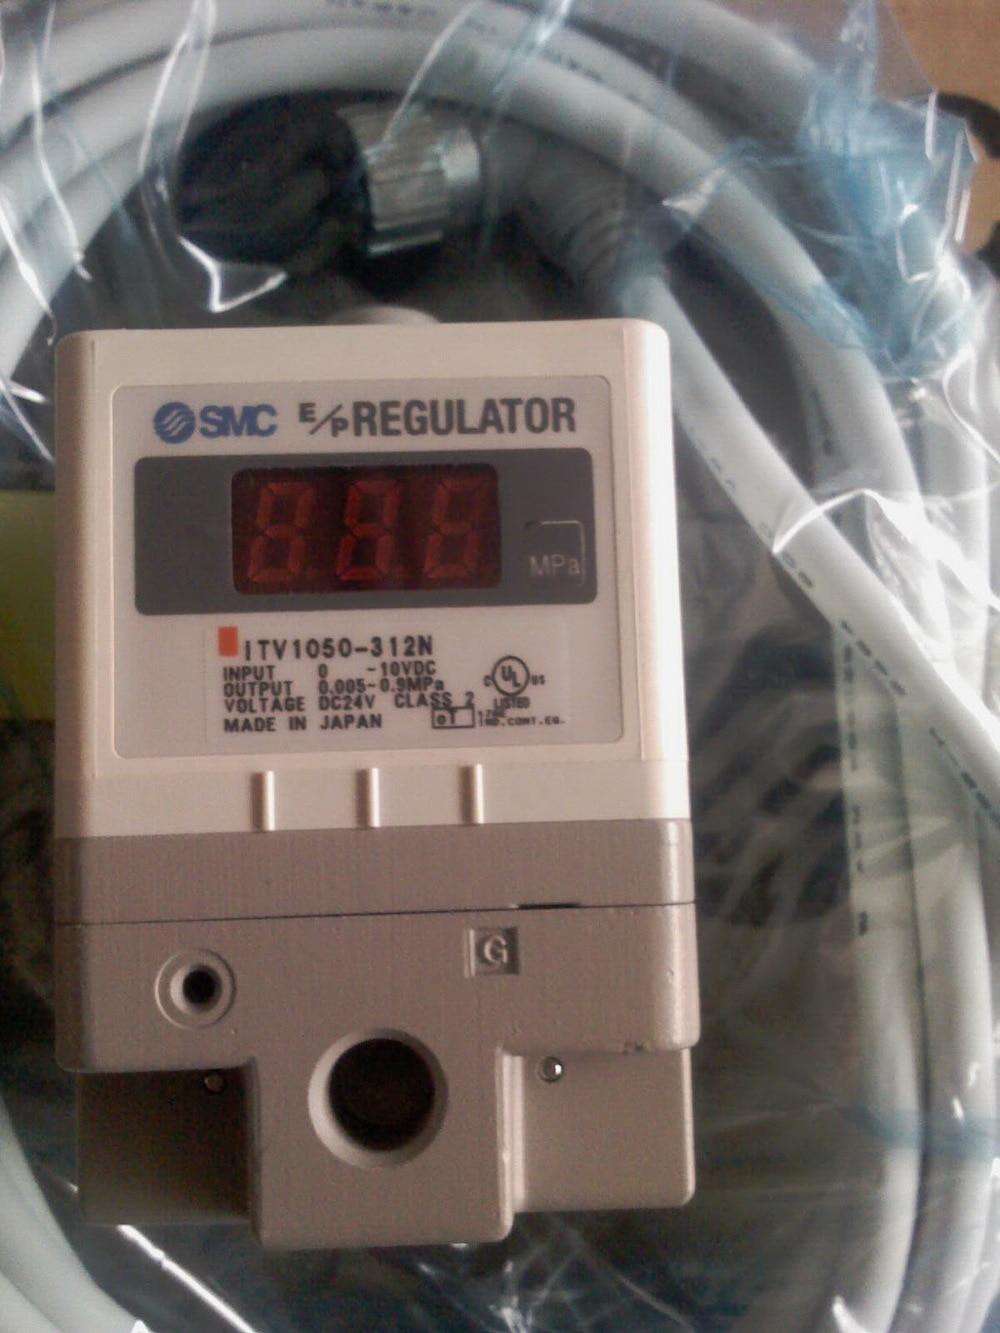 ITV1030-311L ELECTRO/PNEUMATIC REGULATOR, 24VDC 1/8 PORT NEW del:3216 itv2030 312l electro pneumatic regulator 24vdc 1 4 port 0 10v input